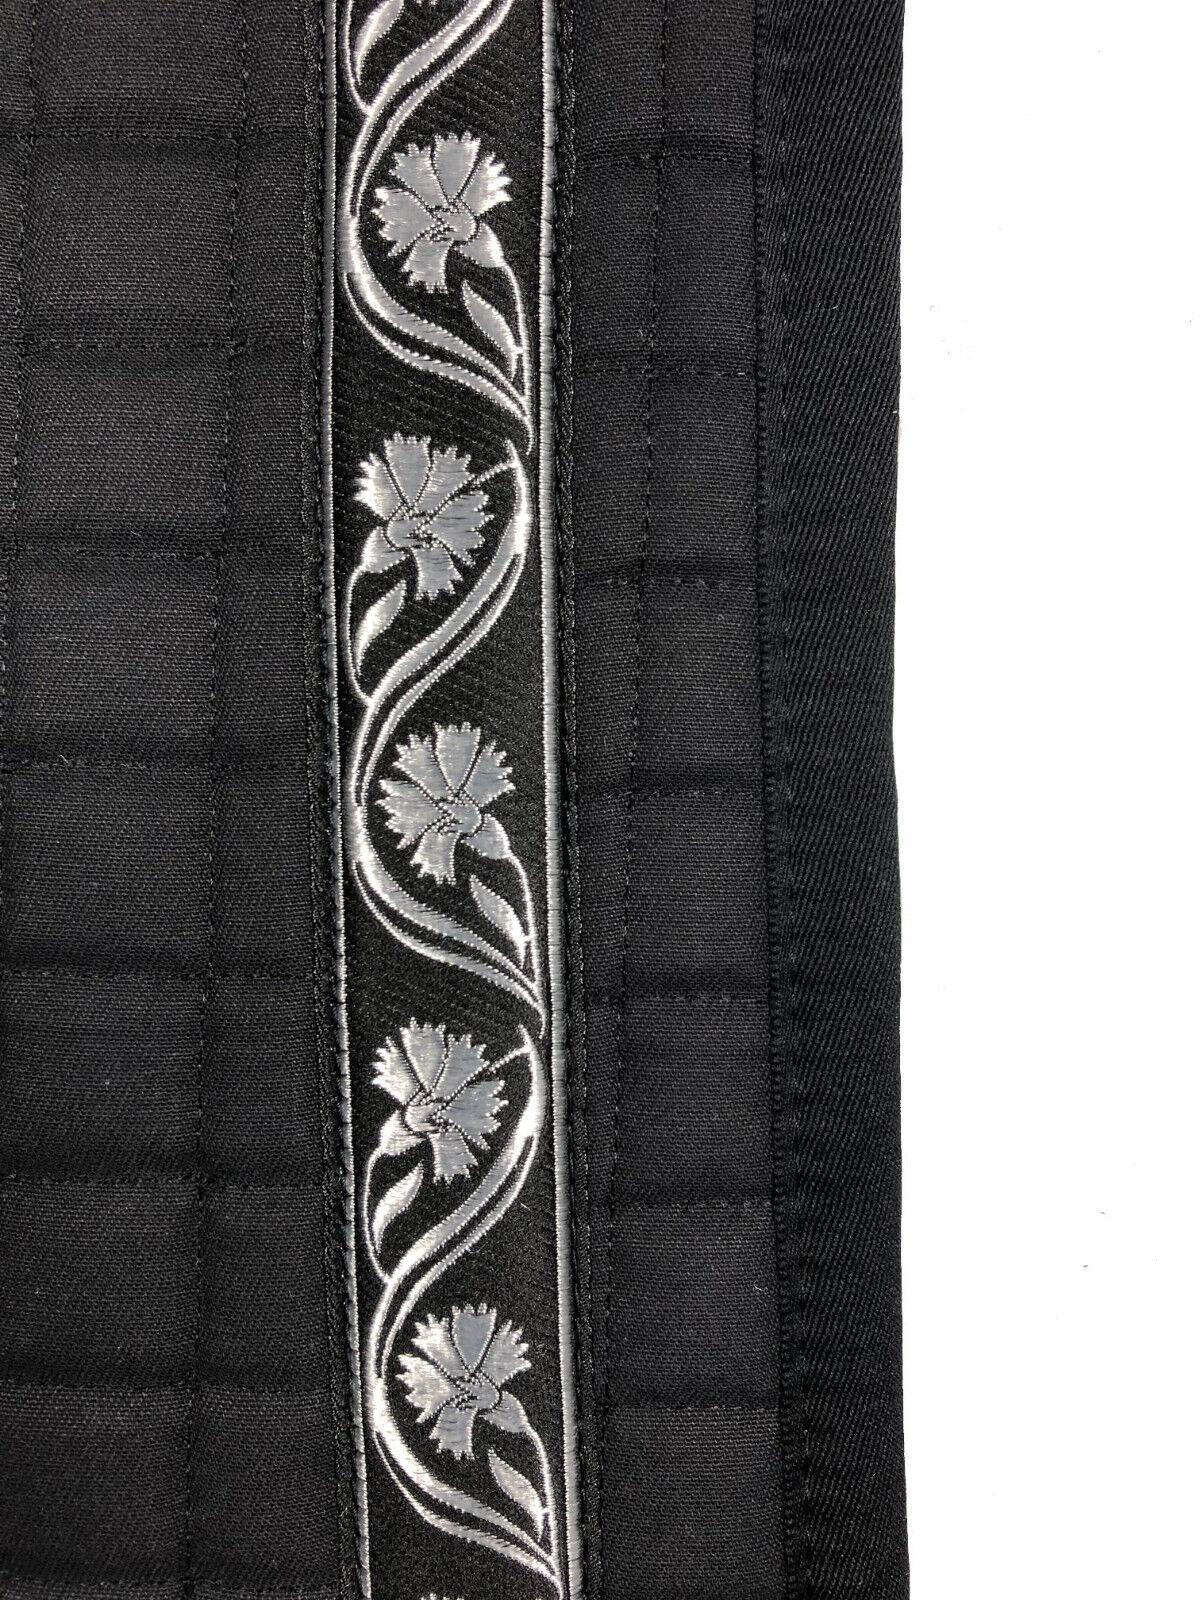 Barock Dressur Schabracke Schwarz mit Borte Silber Lammfell möglich 57 57 57 cm lang 7e453d